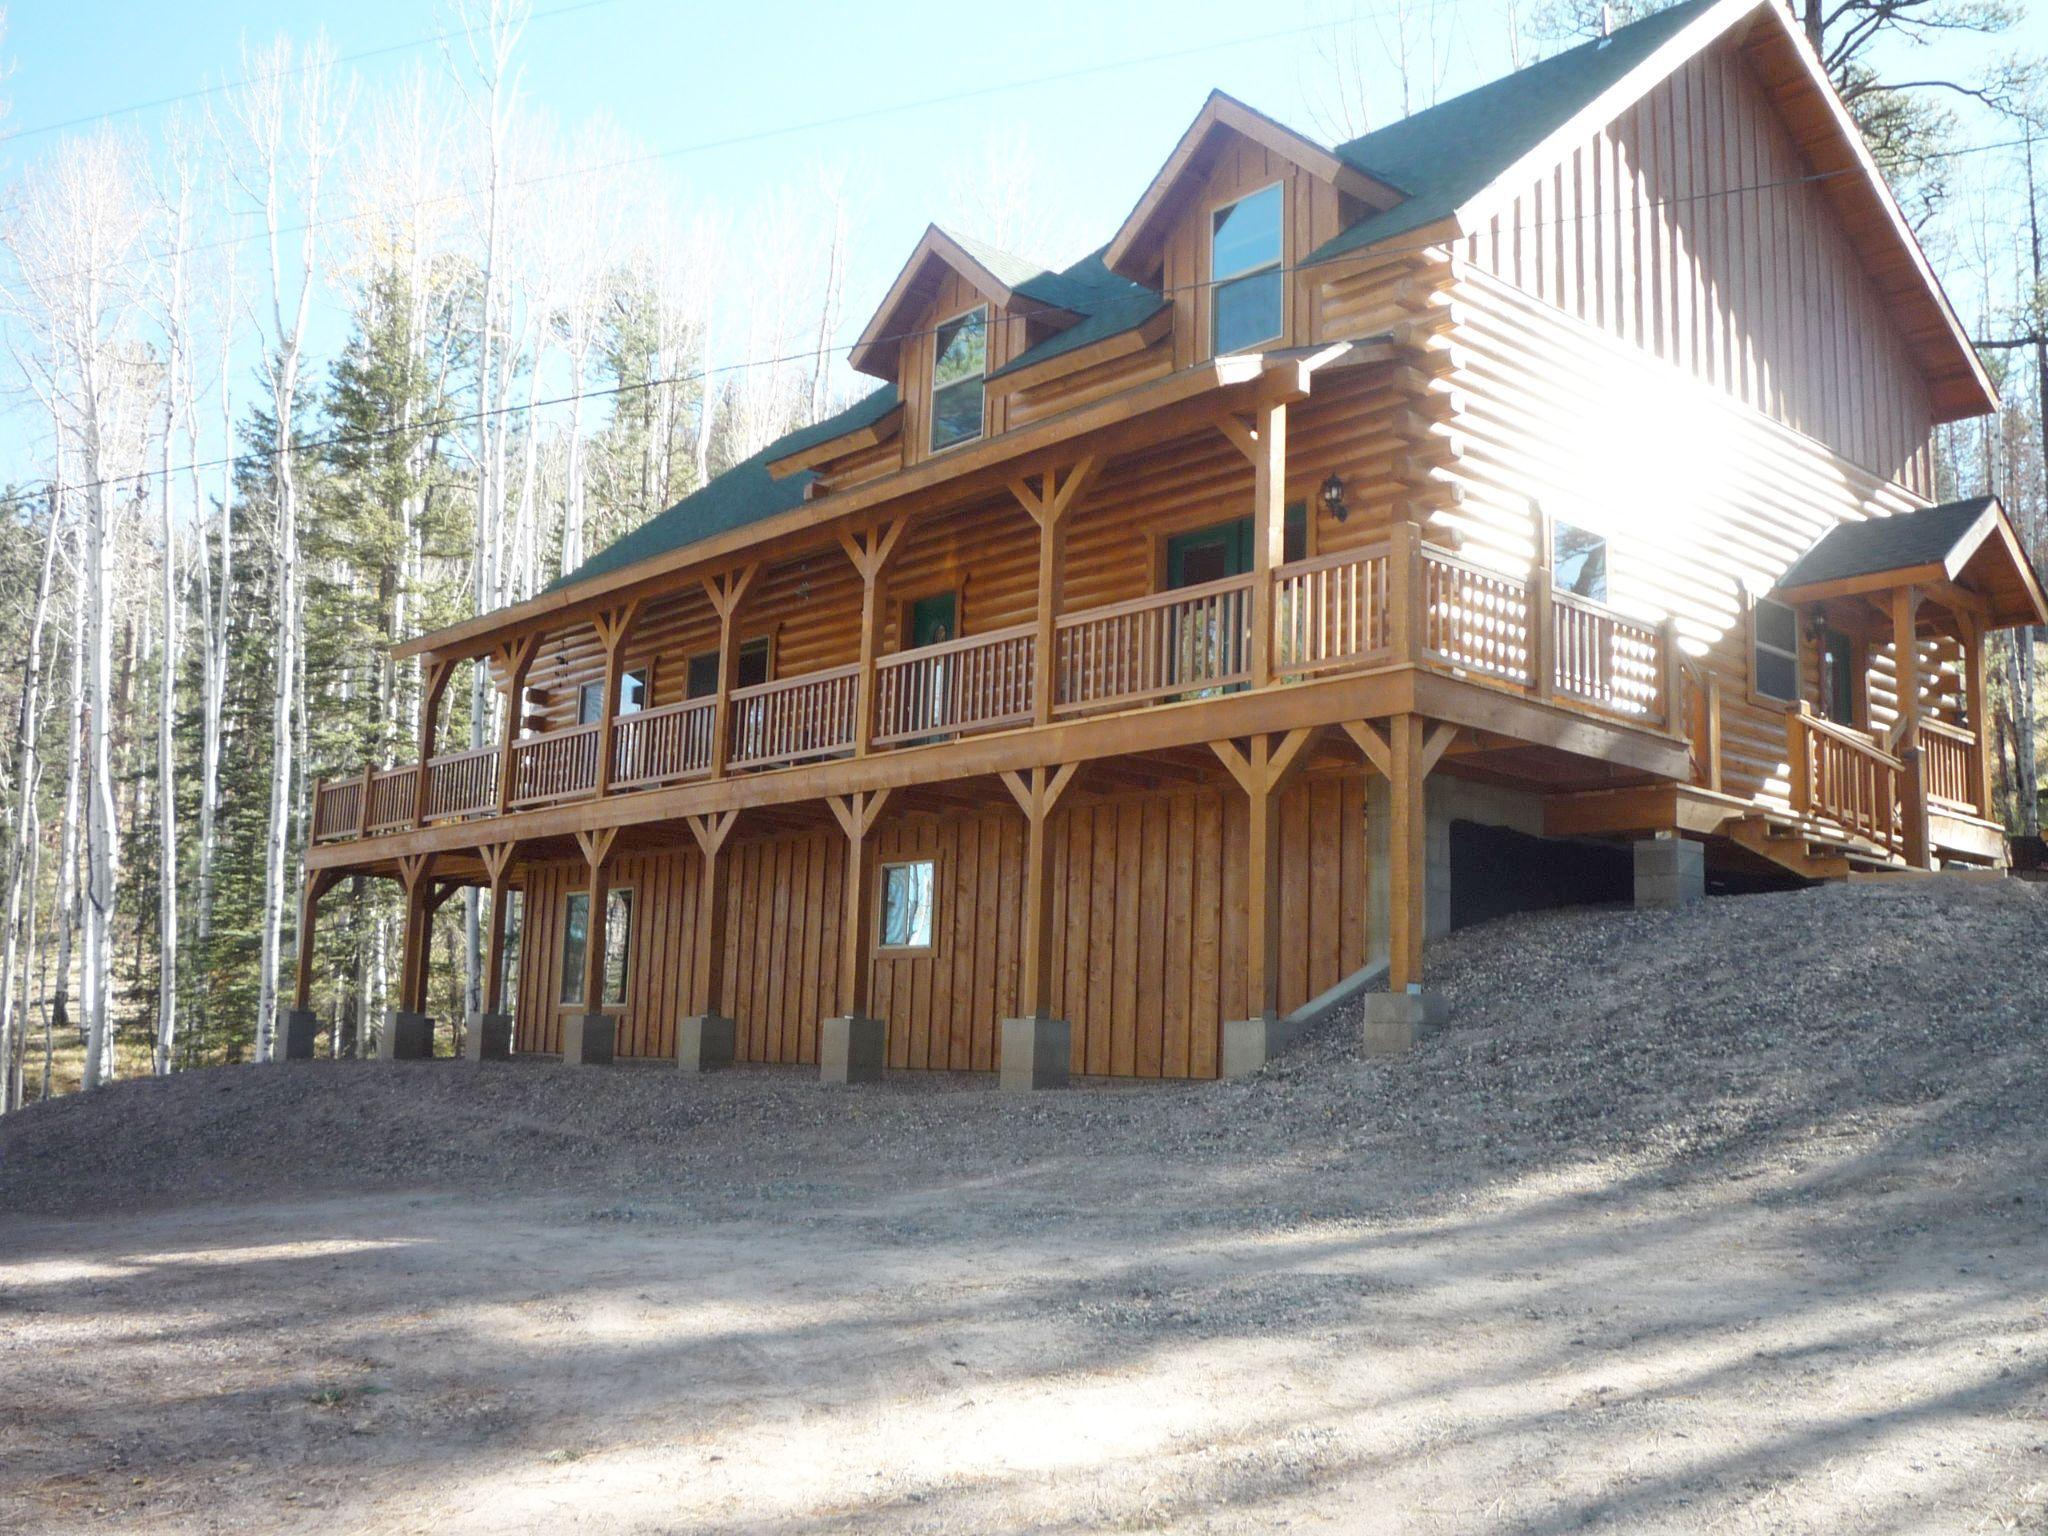 Hokita lodge cabin at the molly butler lodge in greer az for Cabins near greer az